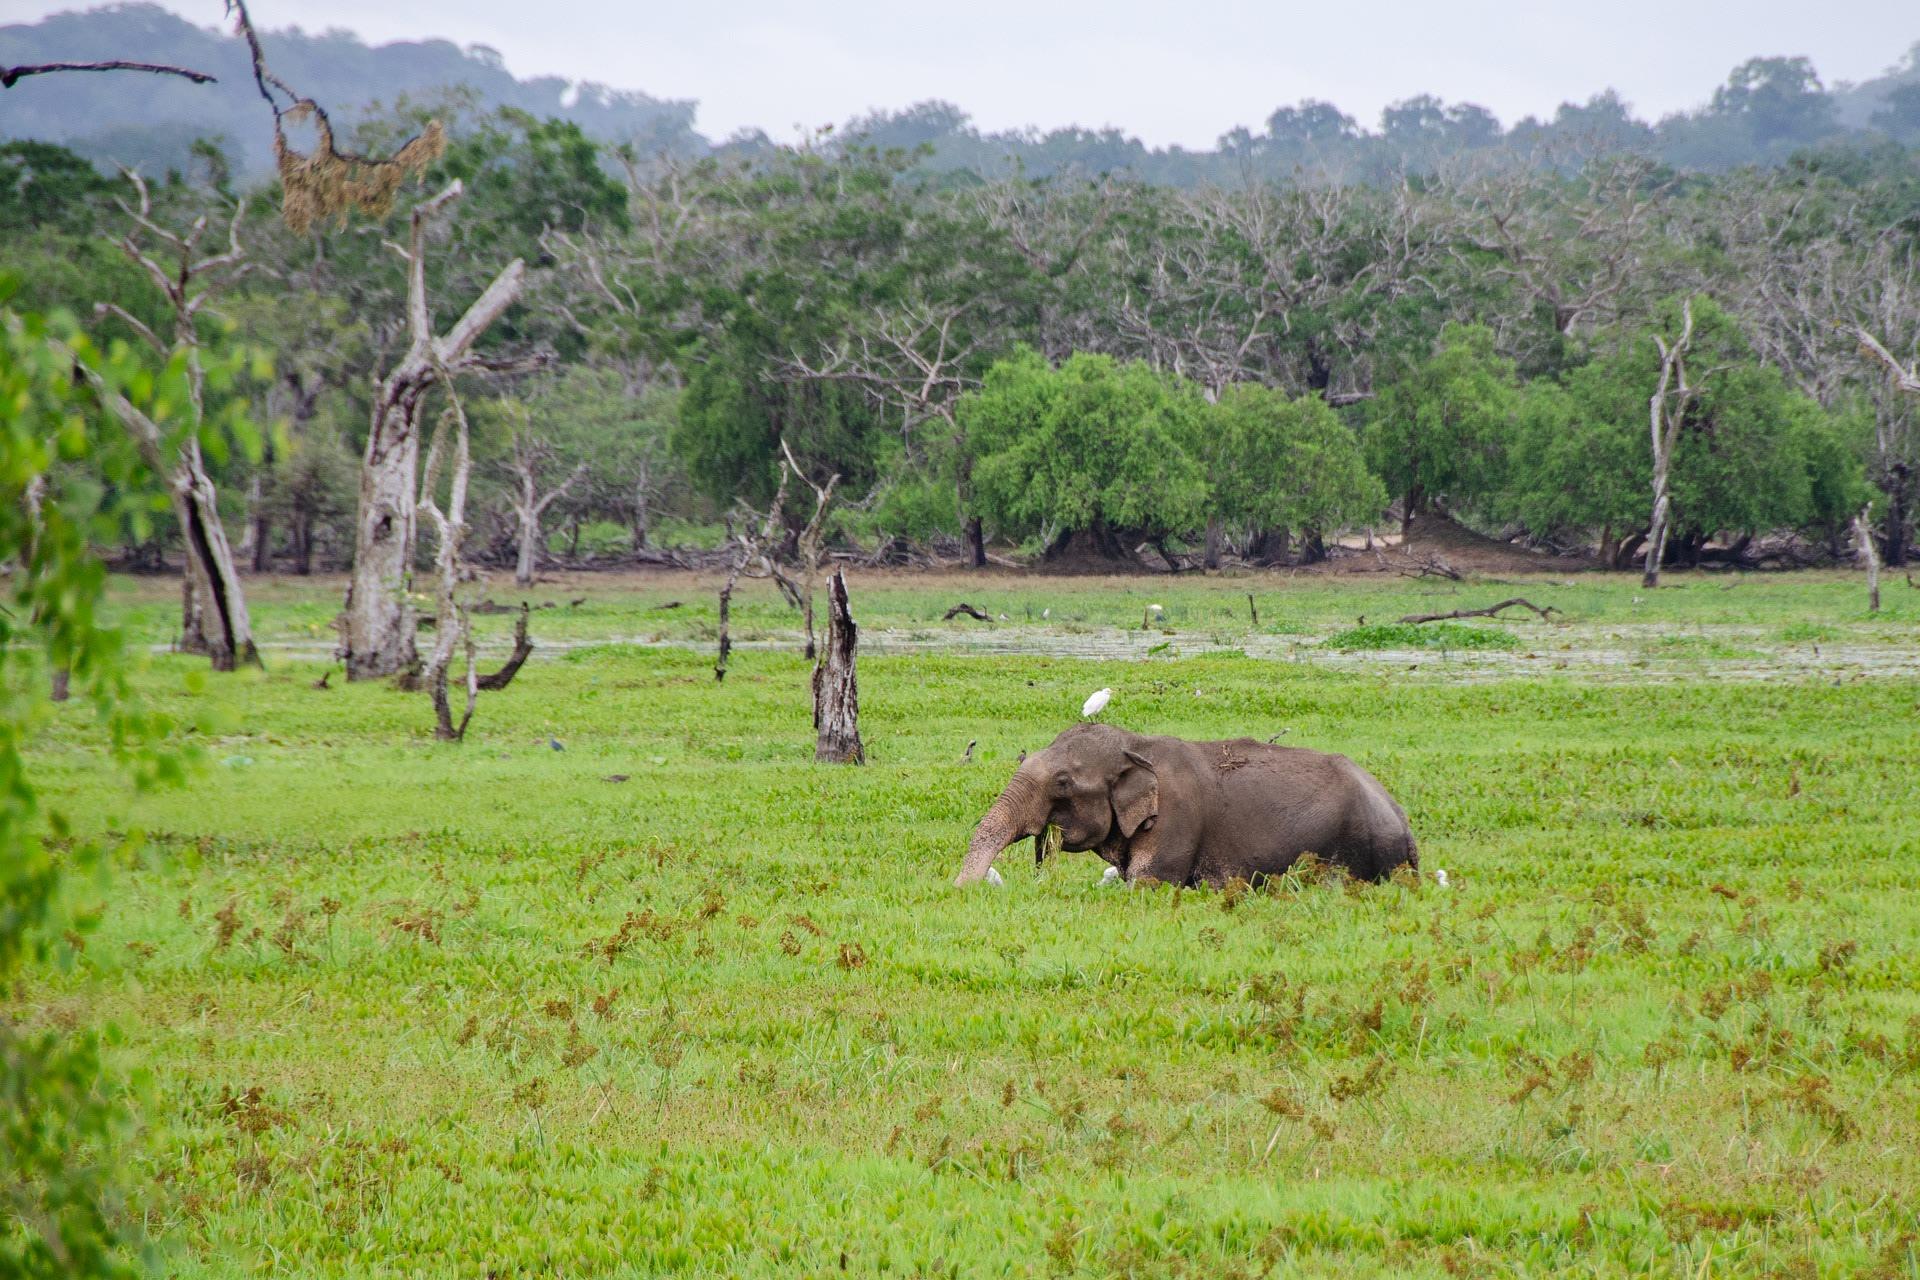 An Elephant at Yala National Park